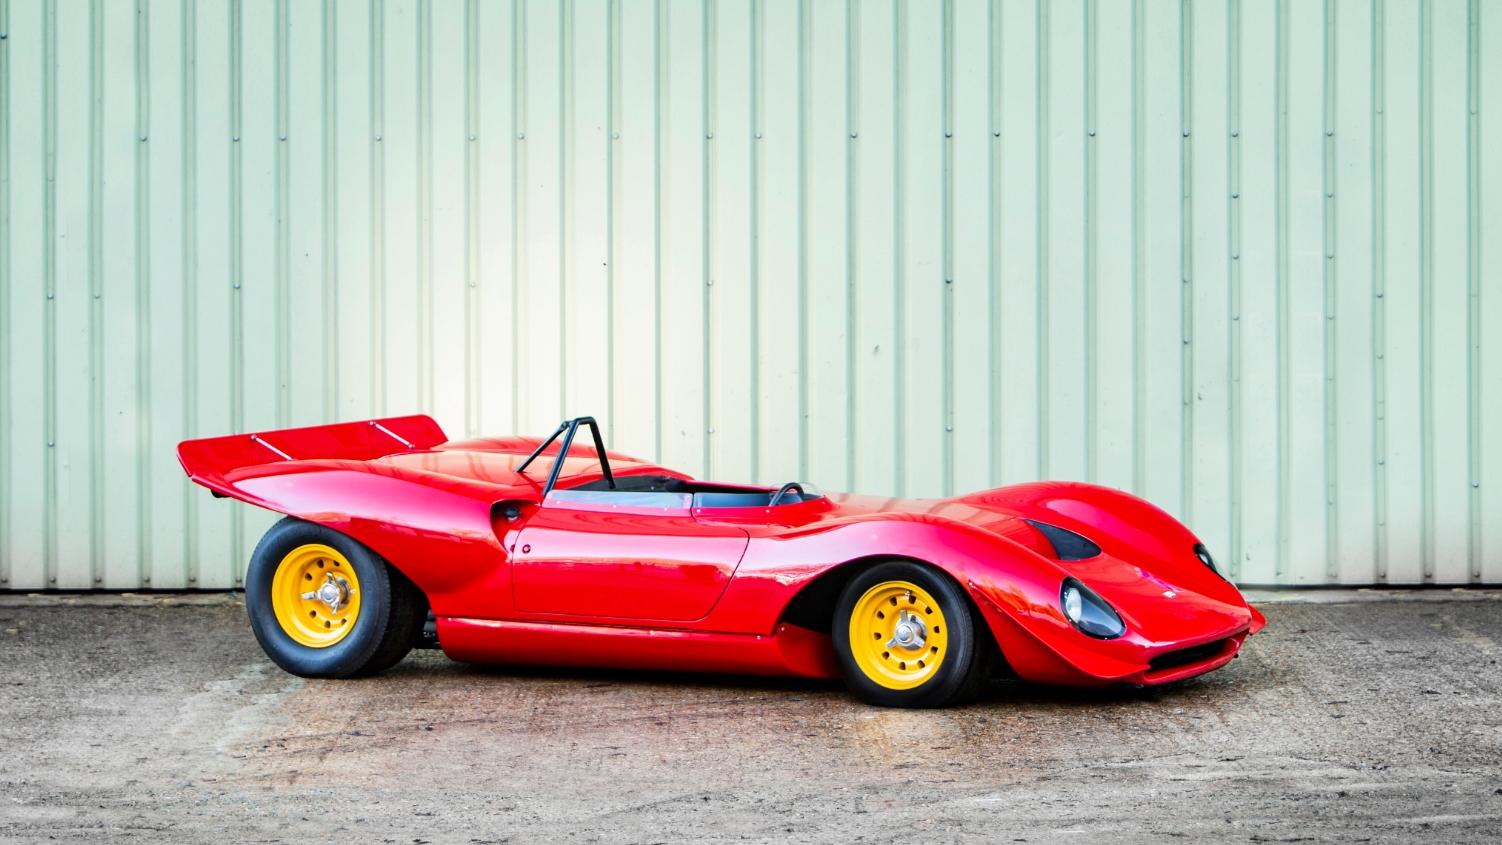 2020 Bonhams Paris Sale Ferrari Dino Announcement Top Classic Car Auctions